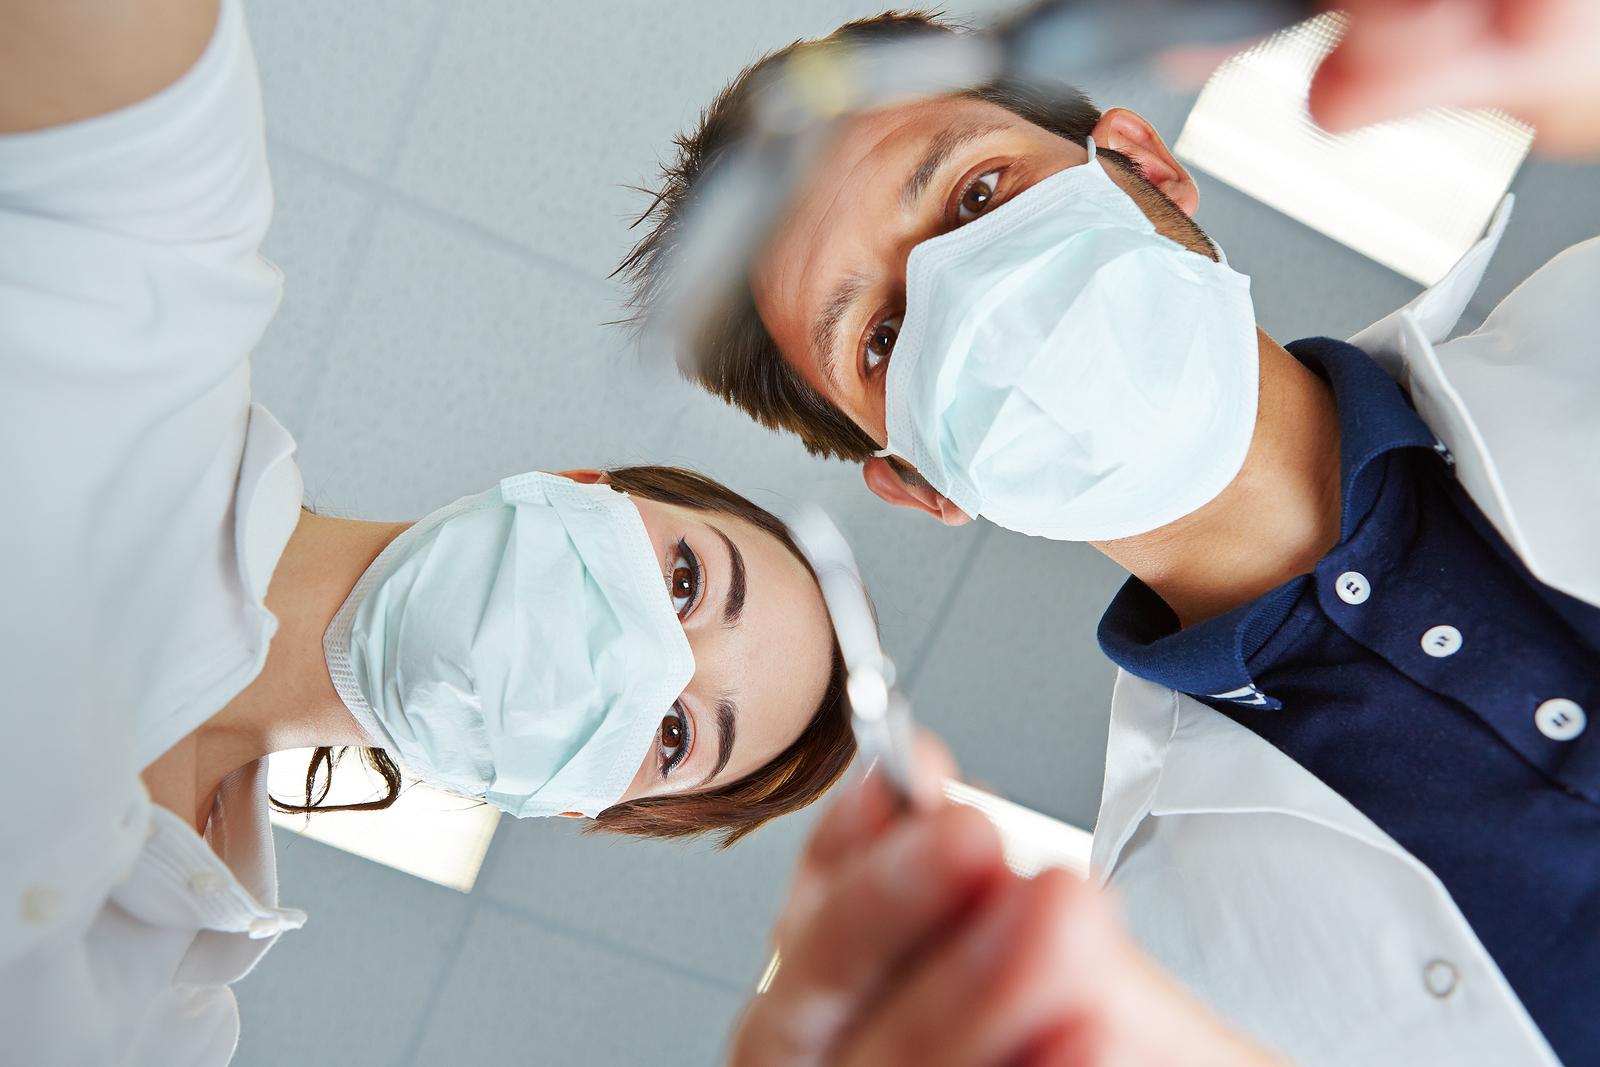 Patient POV of dentist and dental assistant during dental treatm